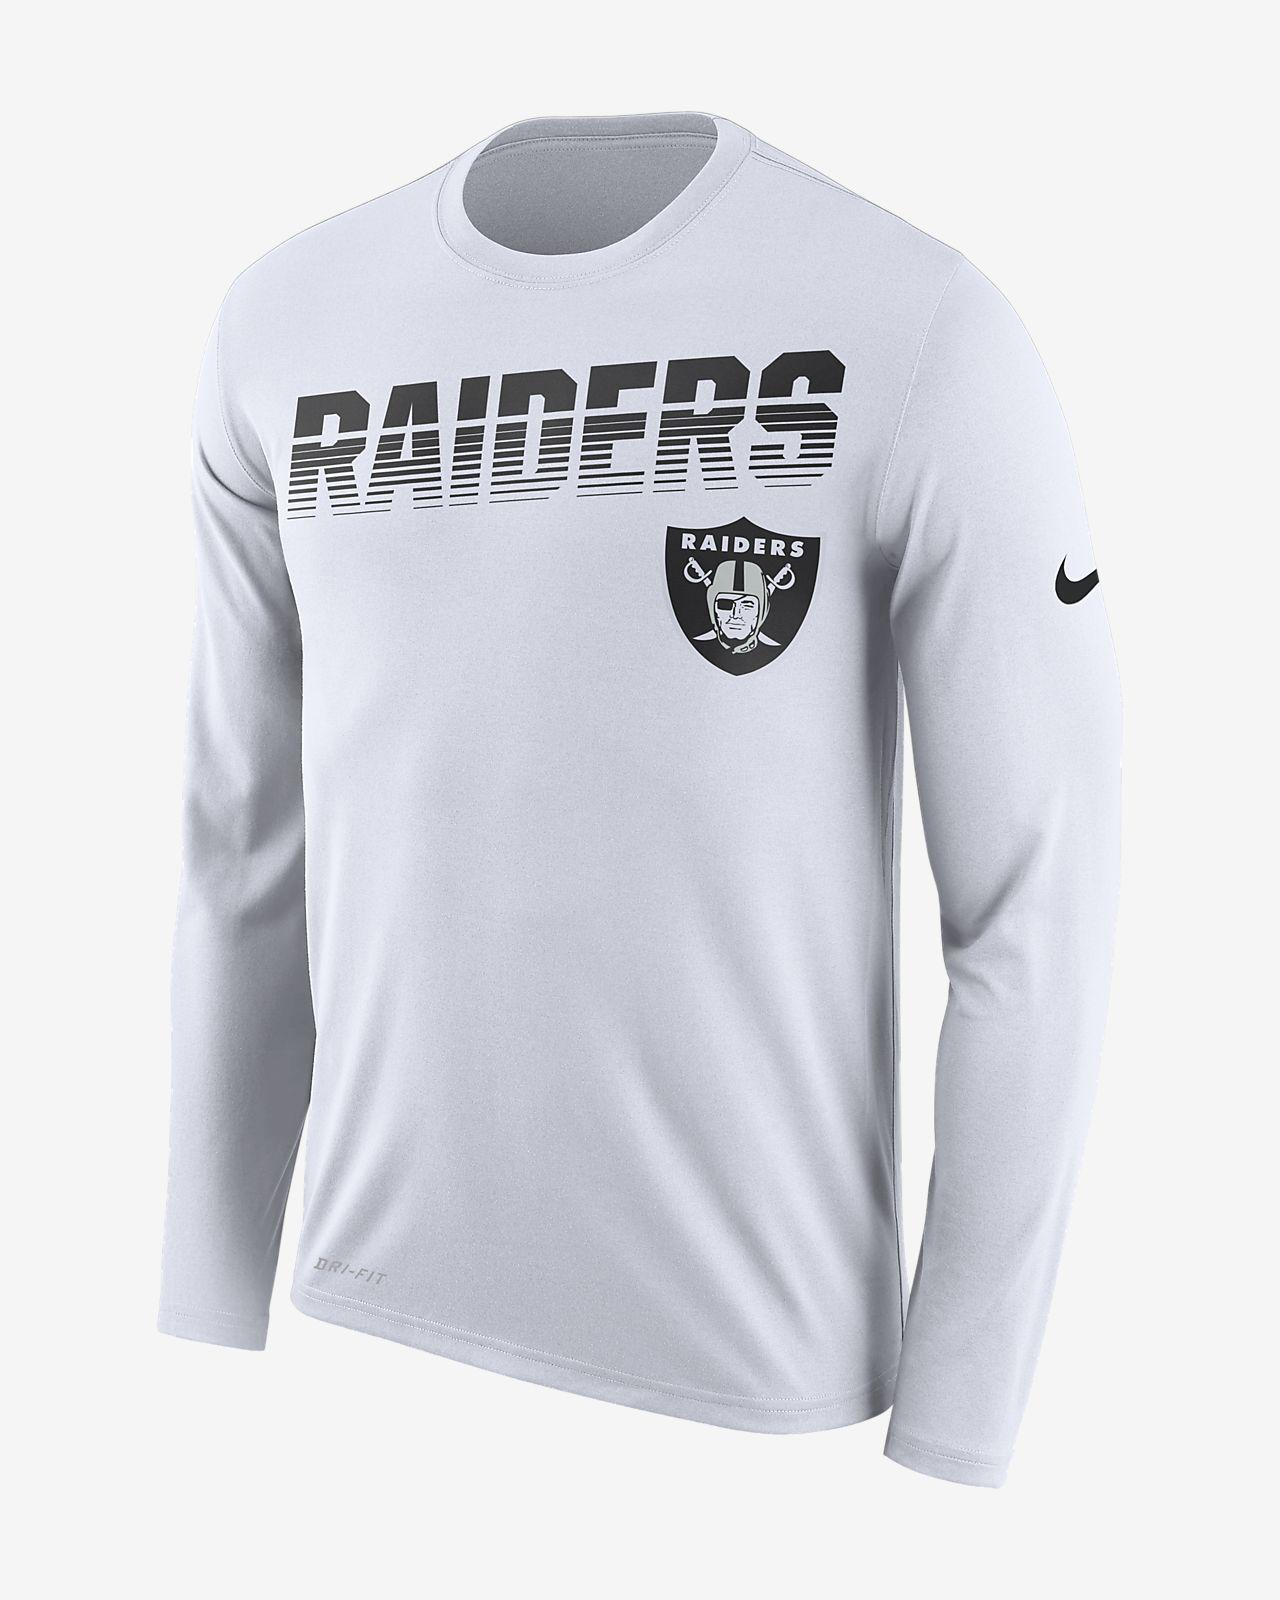 buy online 5bd9d 653f2 Nike Legend (NFL Raiders) Men's Long-Sleeve T-Shirt